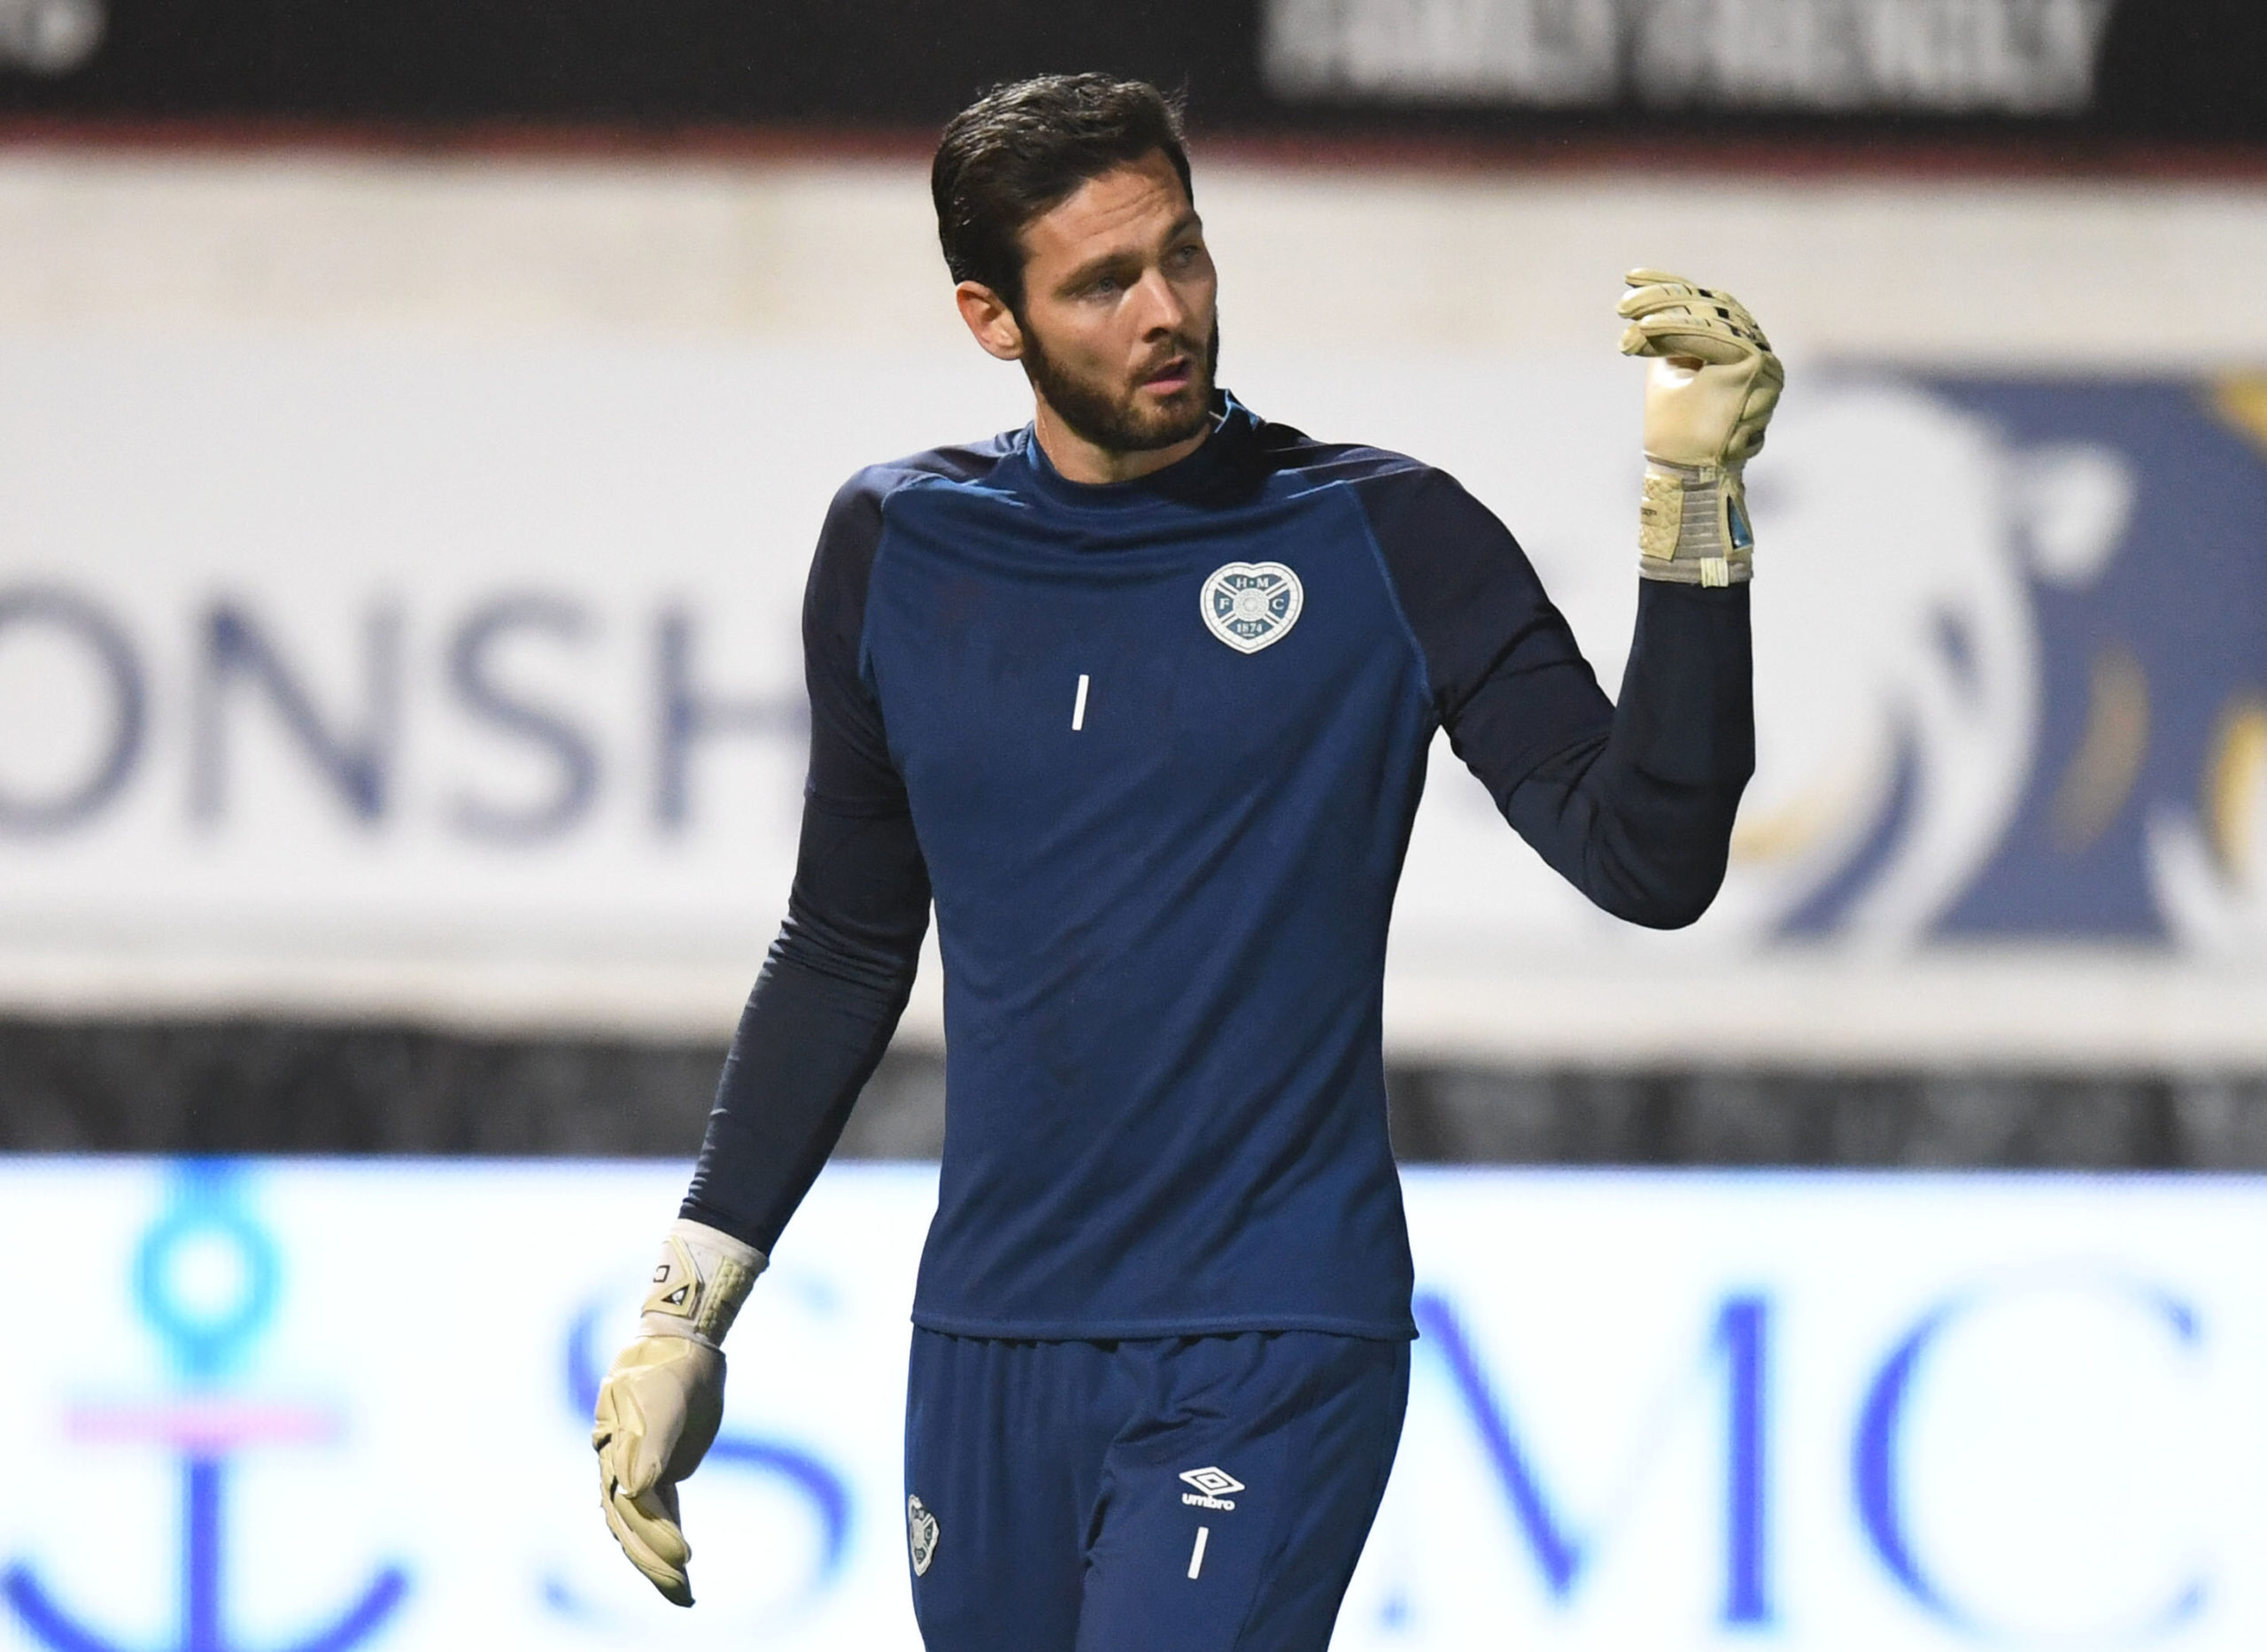 Hearts goalkeeper Craig Gordon